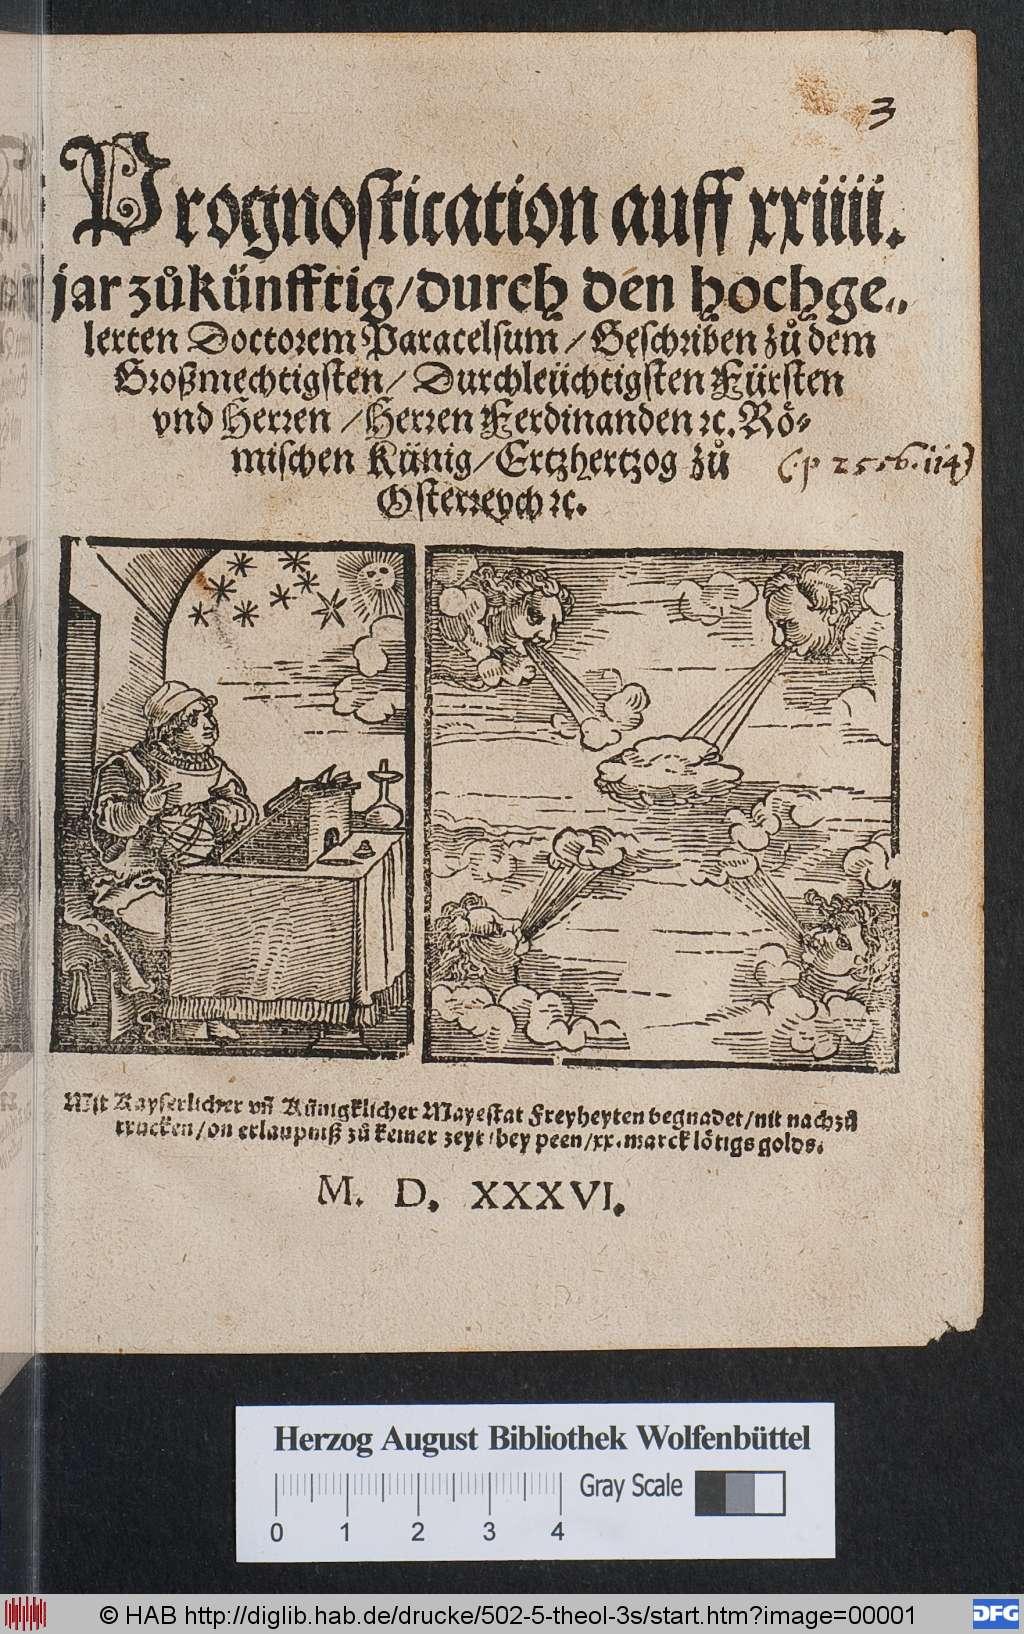 http://diglib.hab.de/drucke/502-5-theol-3s/00001.jpg